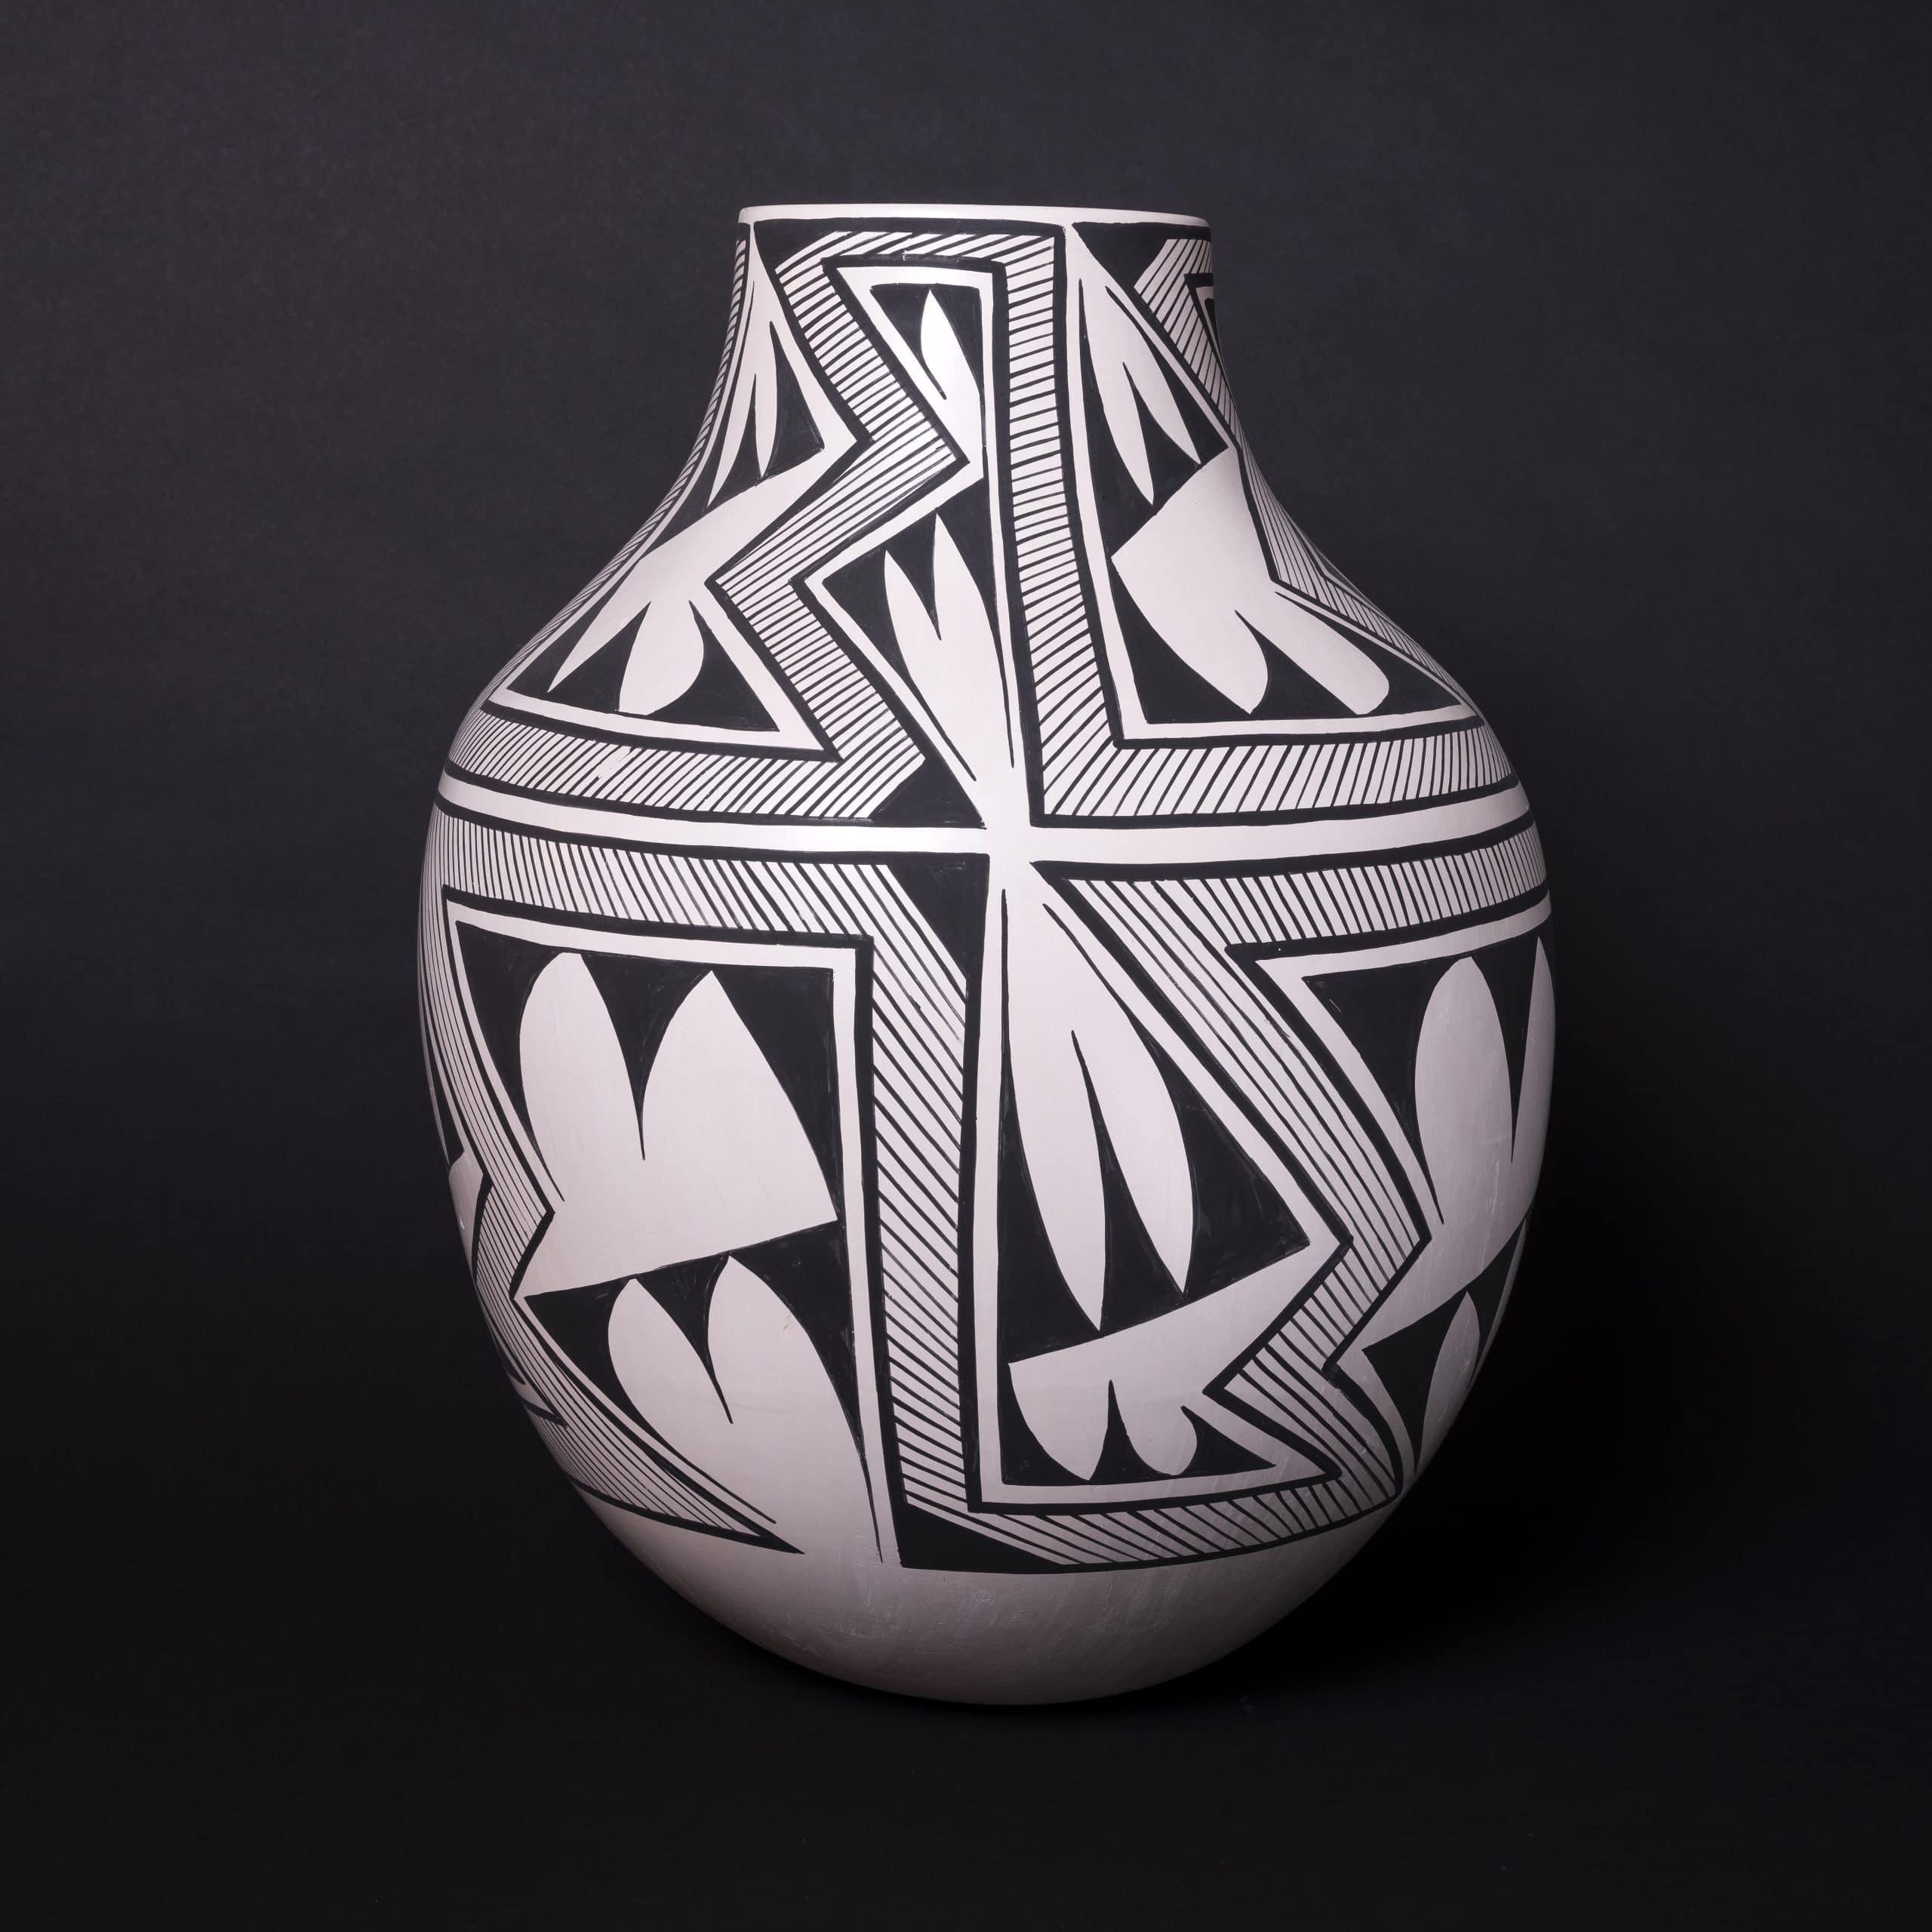 "Chaco America, Jacob Thomas Frye (Tesuque Pueblo), 18"" x 16"", Earthenware clay, stone polish, 08 kiln fired, commercial jet black"